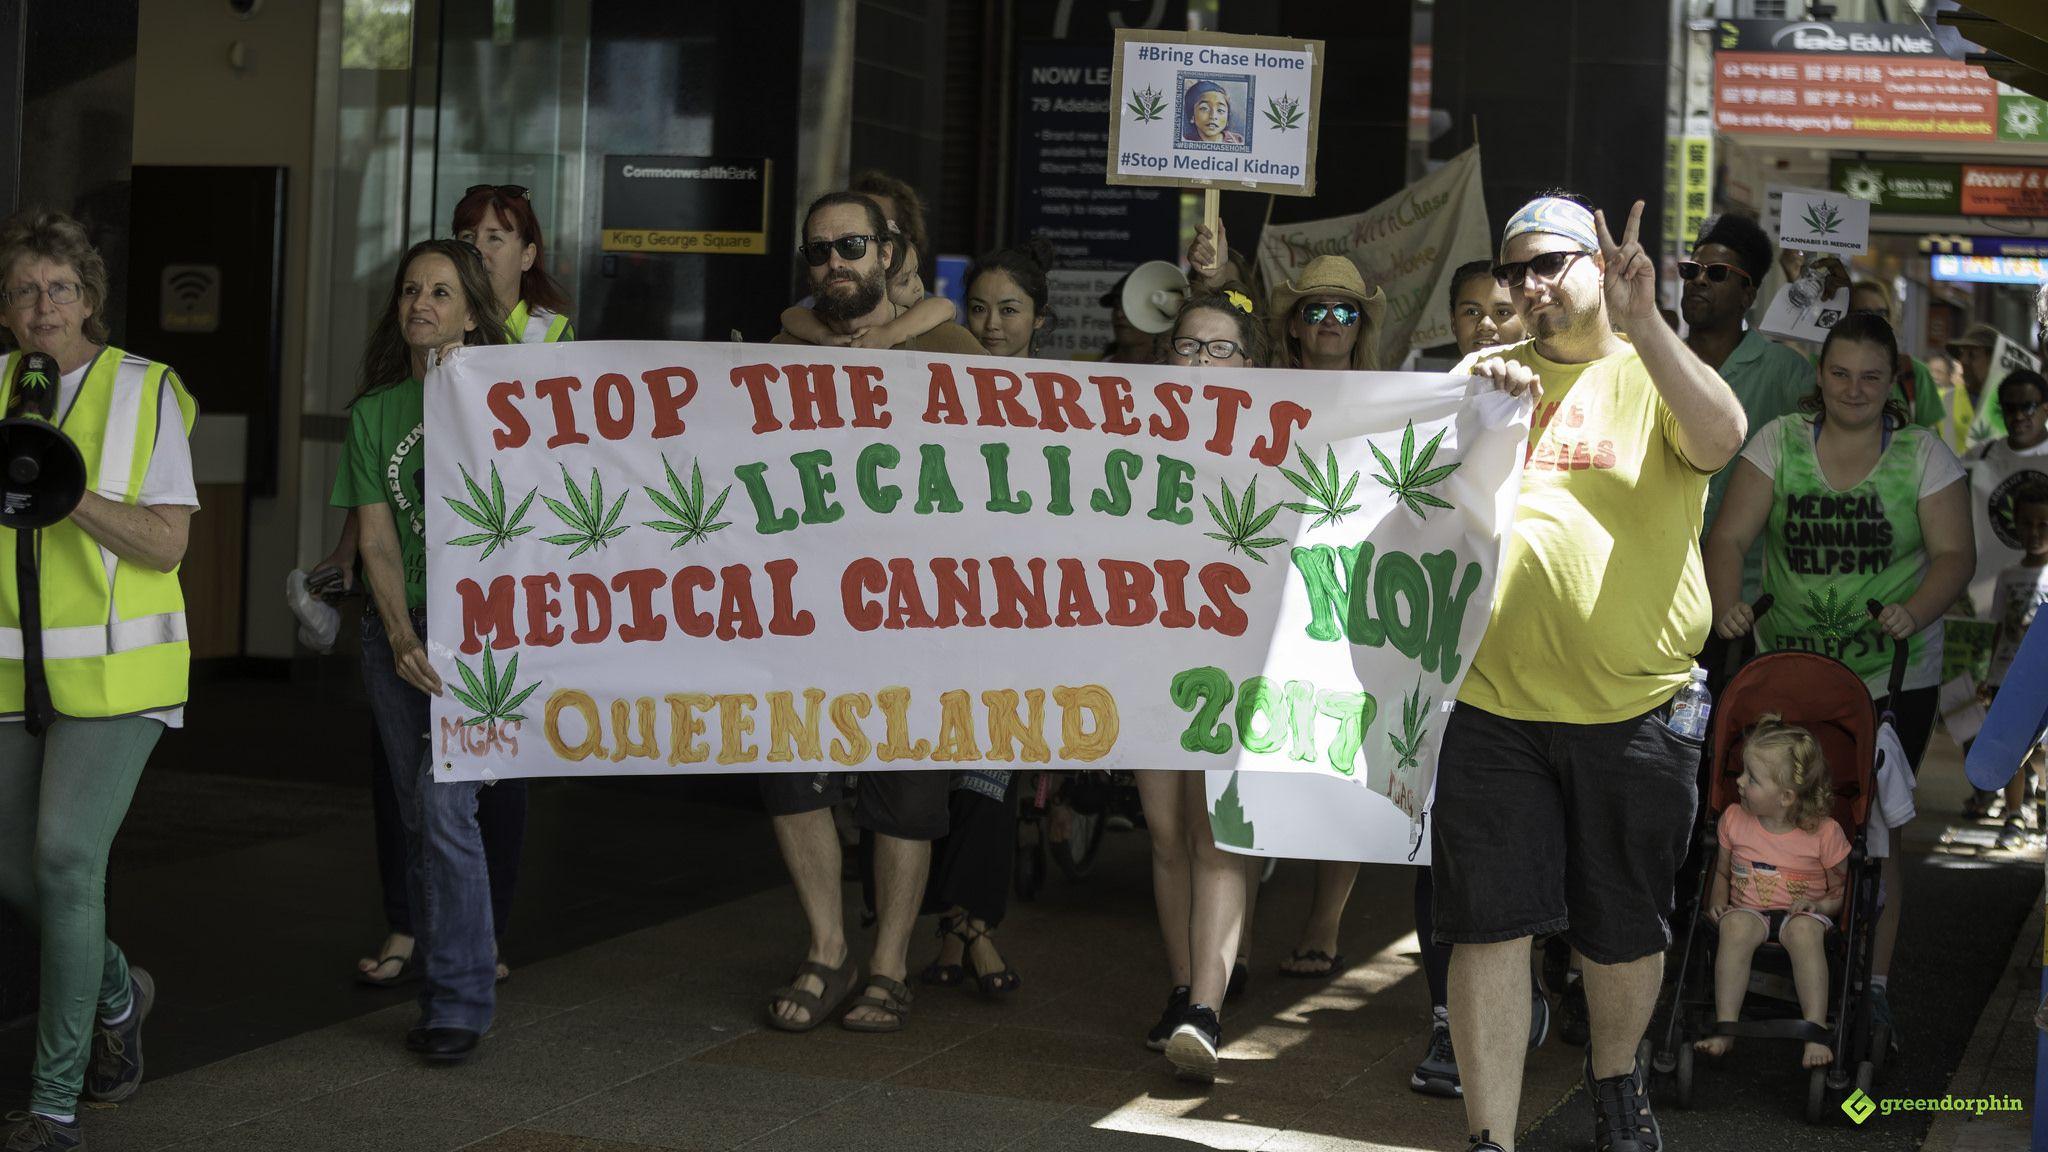 Medical Cannabis Law Reform Rally and March - Brisbane Australia